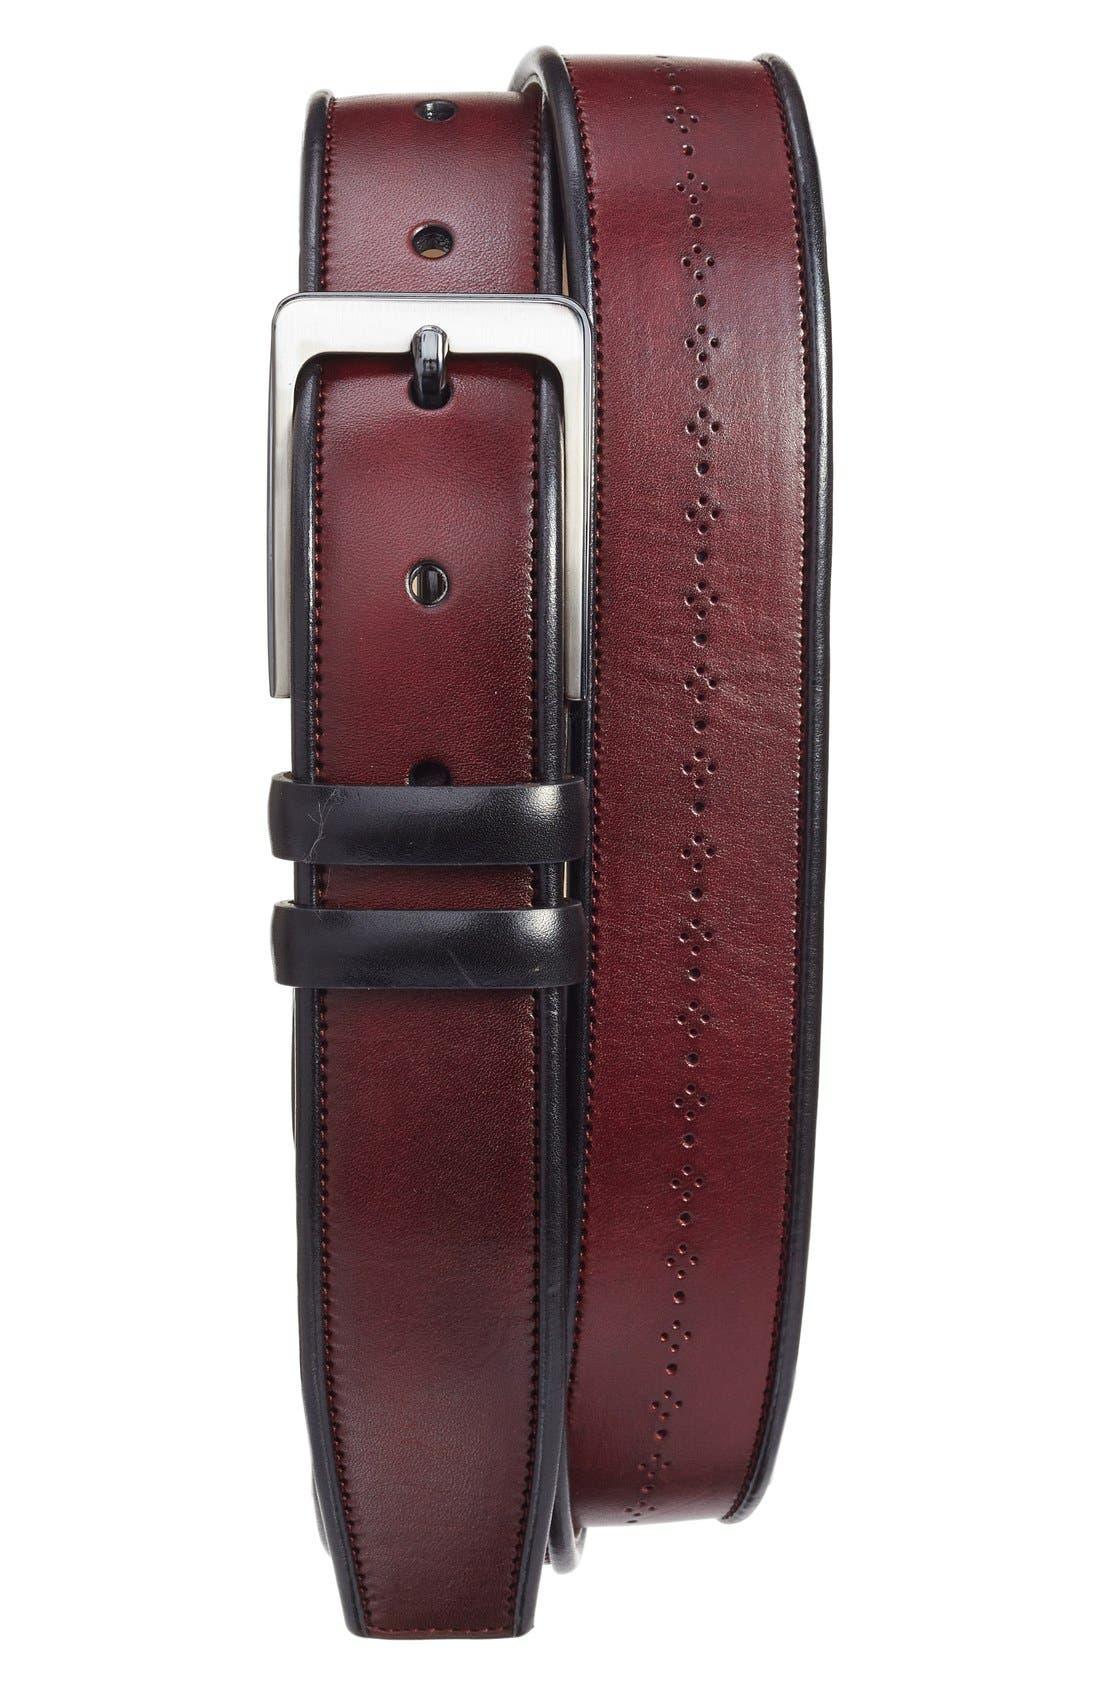 MEZLAN Ascot/Diver Leather Belt